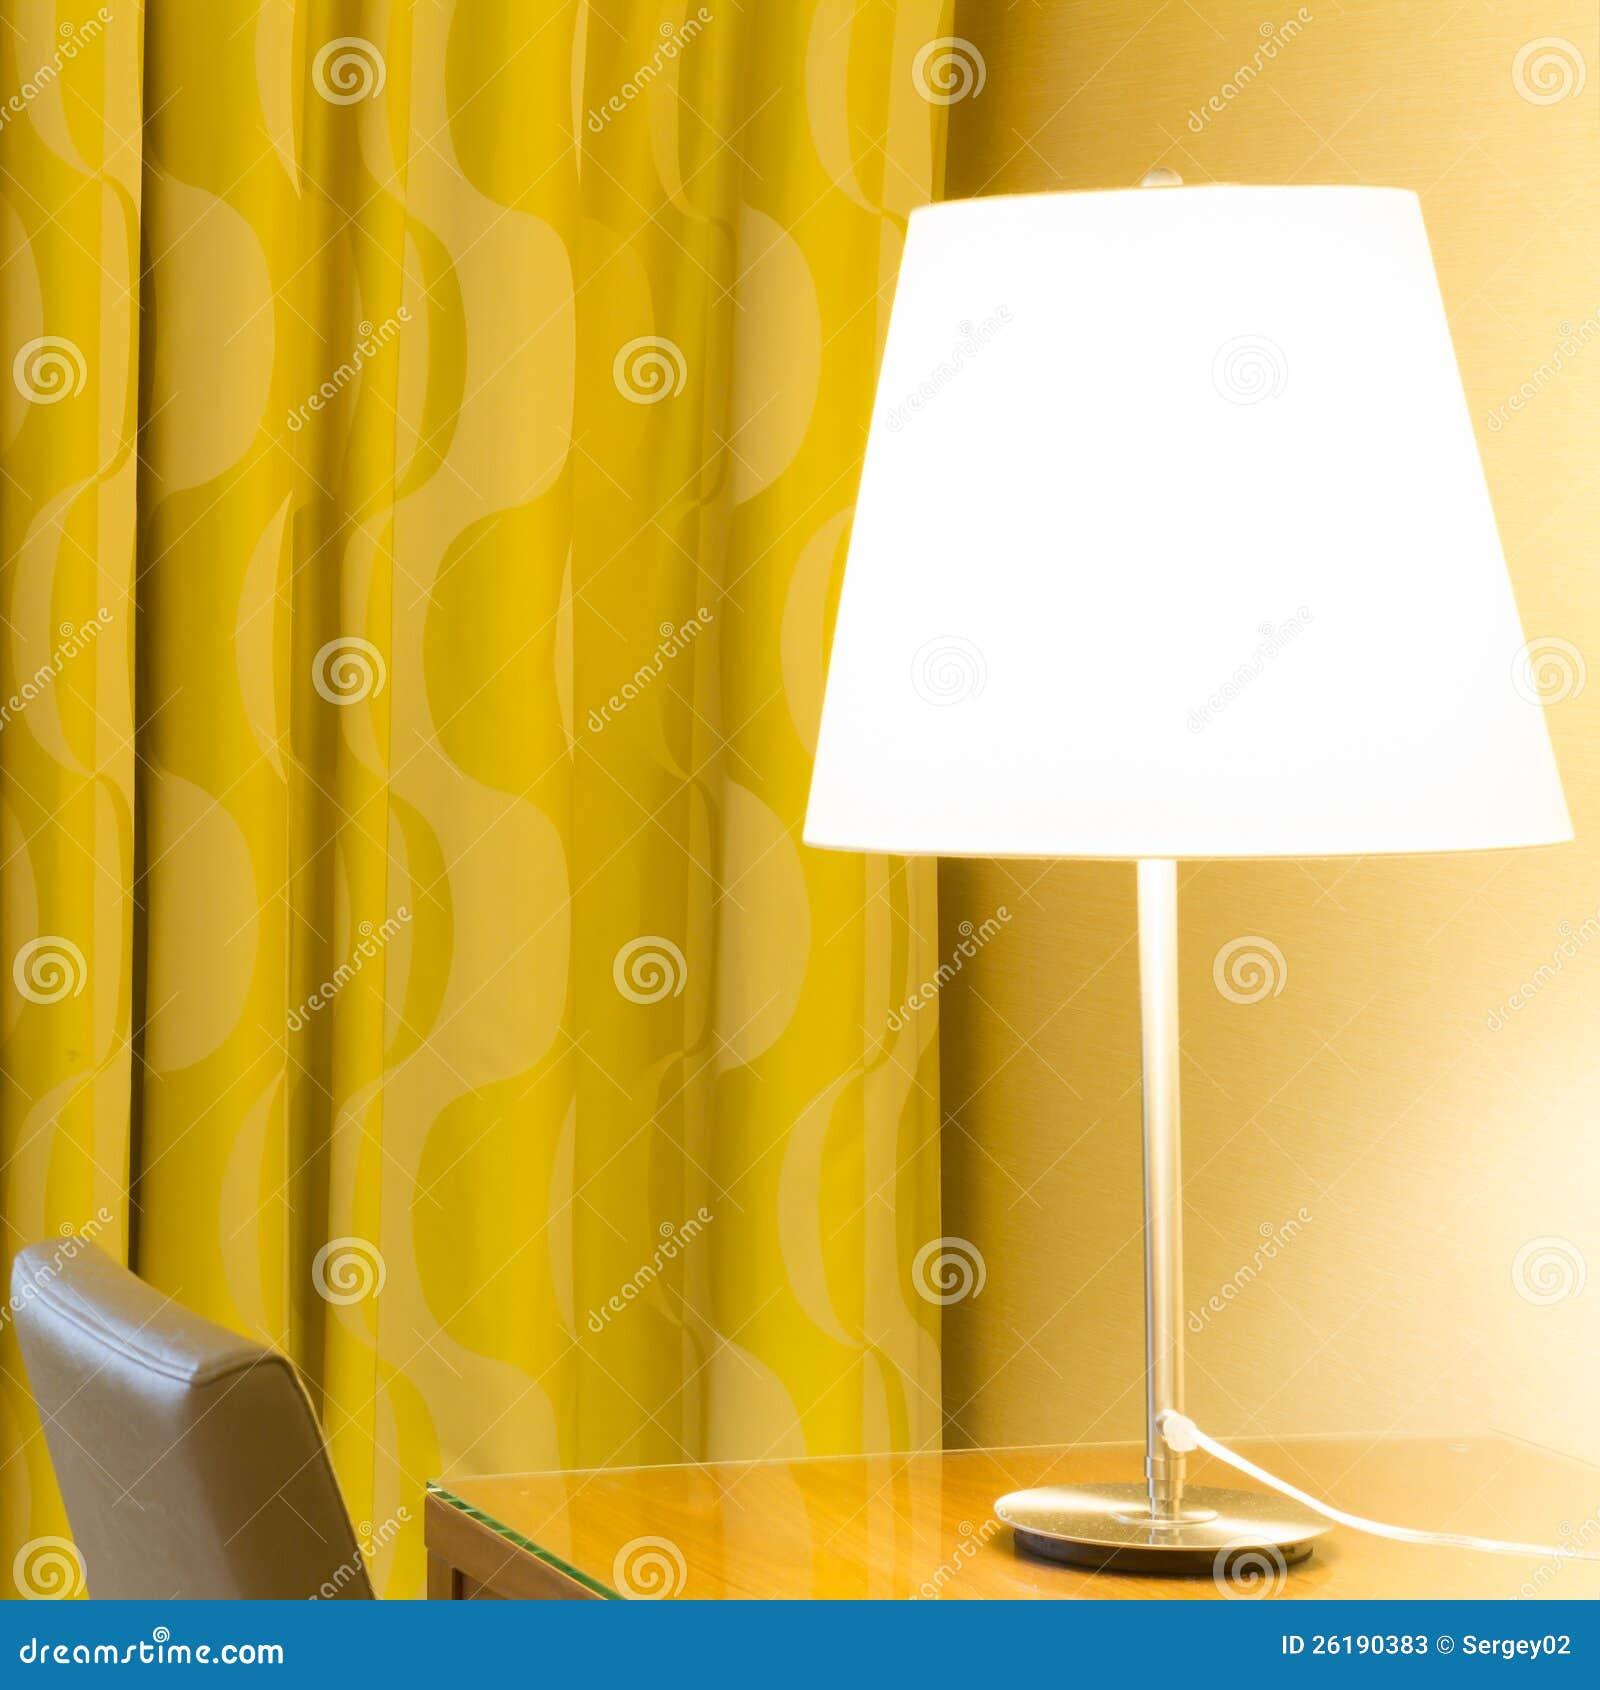 Interior Design Stock Photos Image 26190383